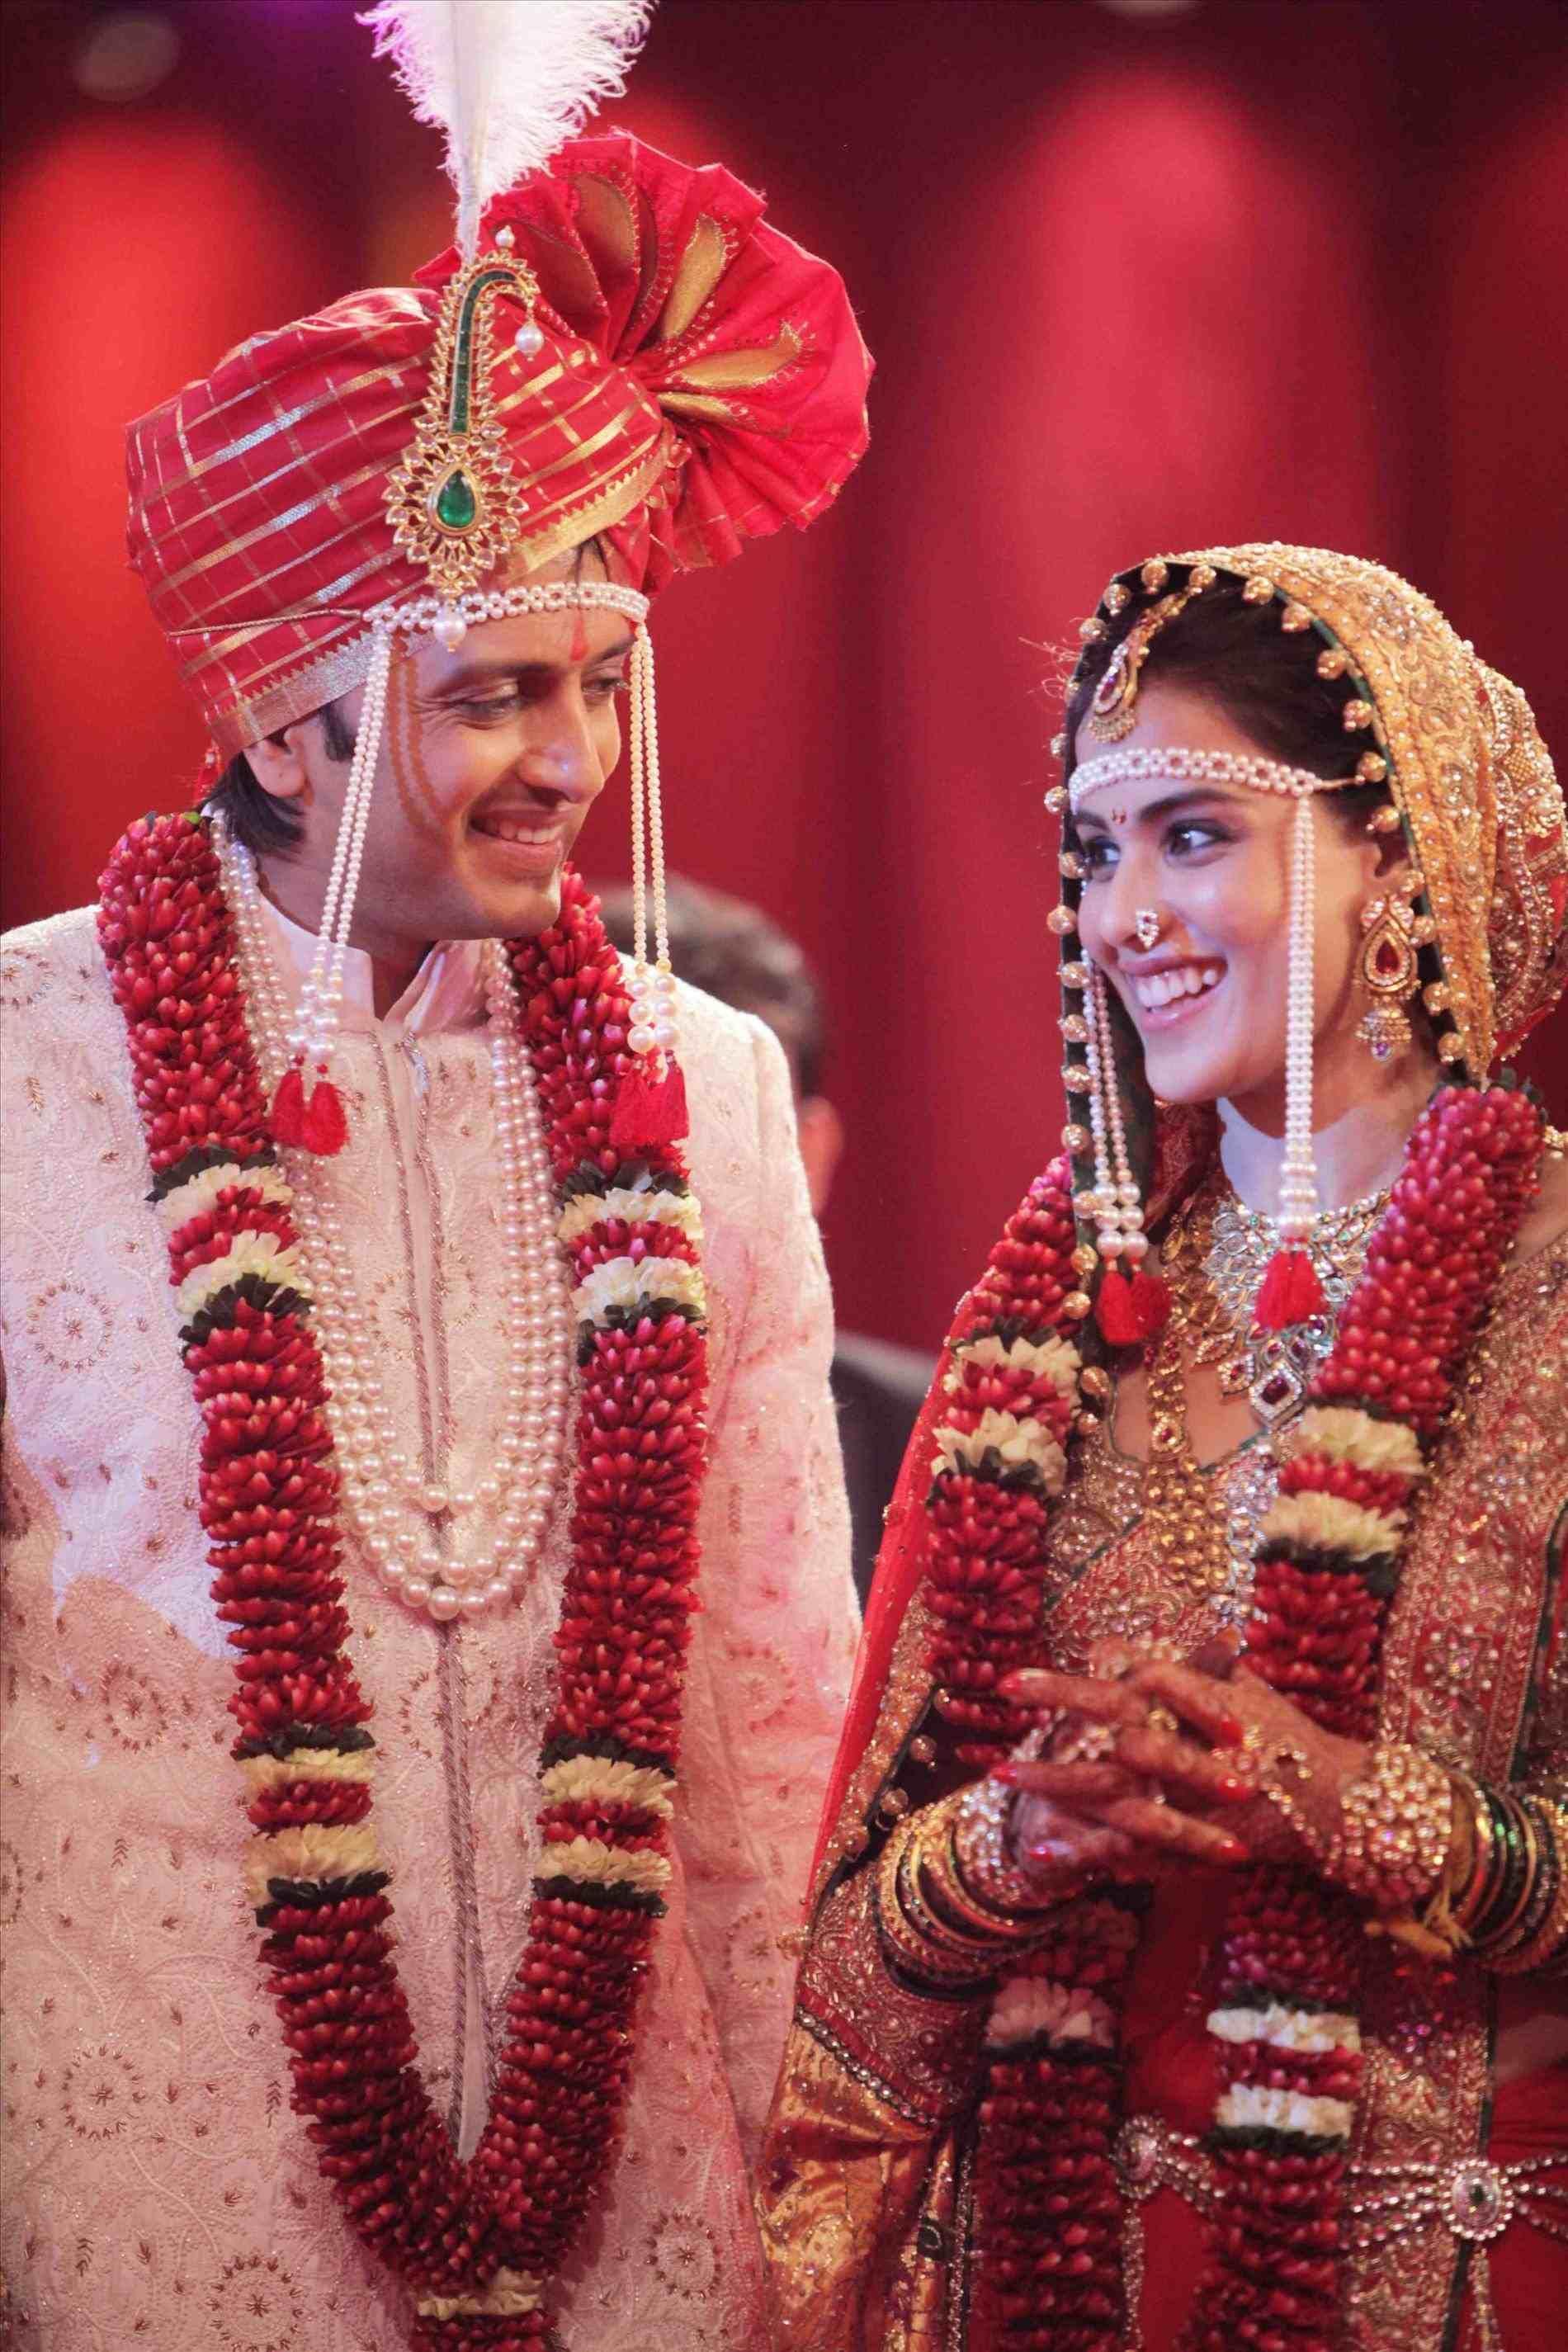 indian couple wedding dress (With images) Indian wedding